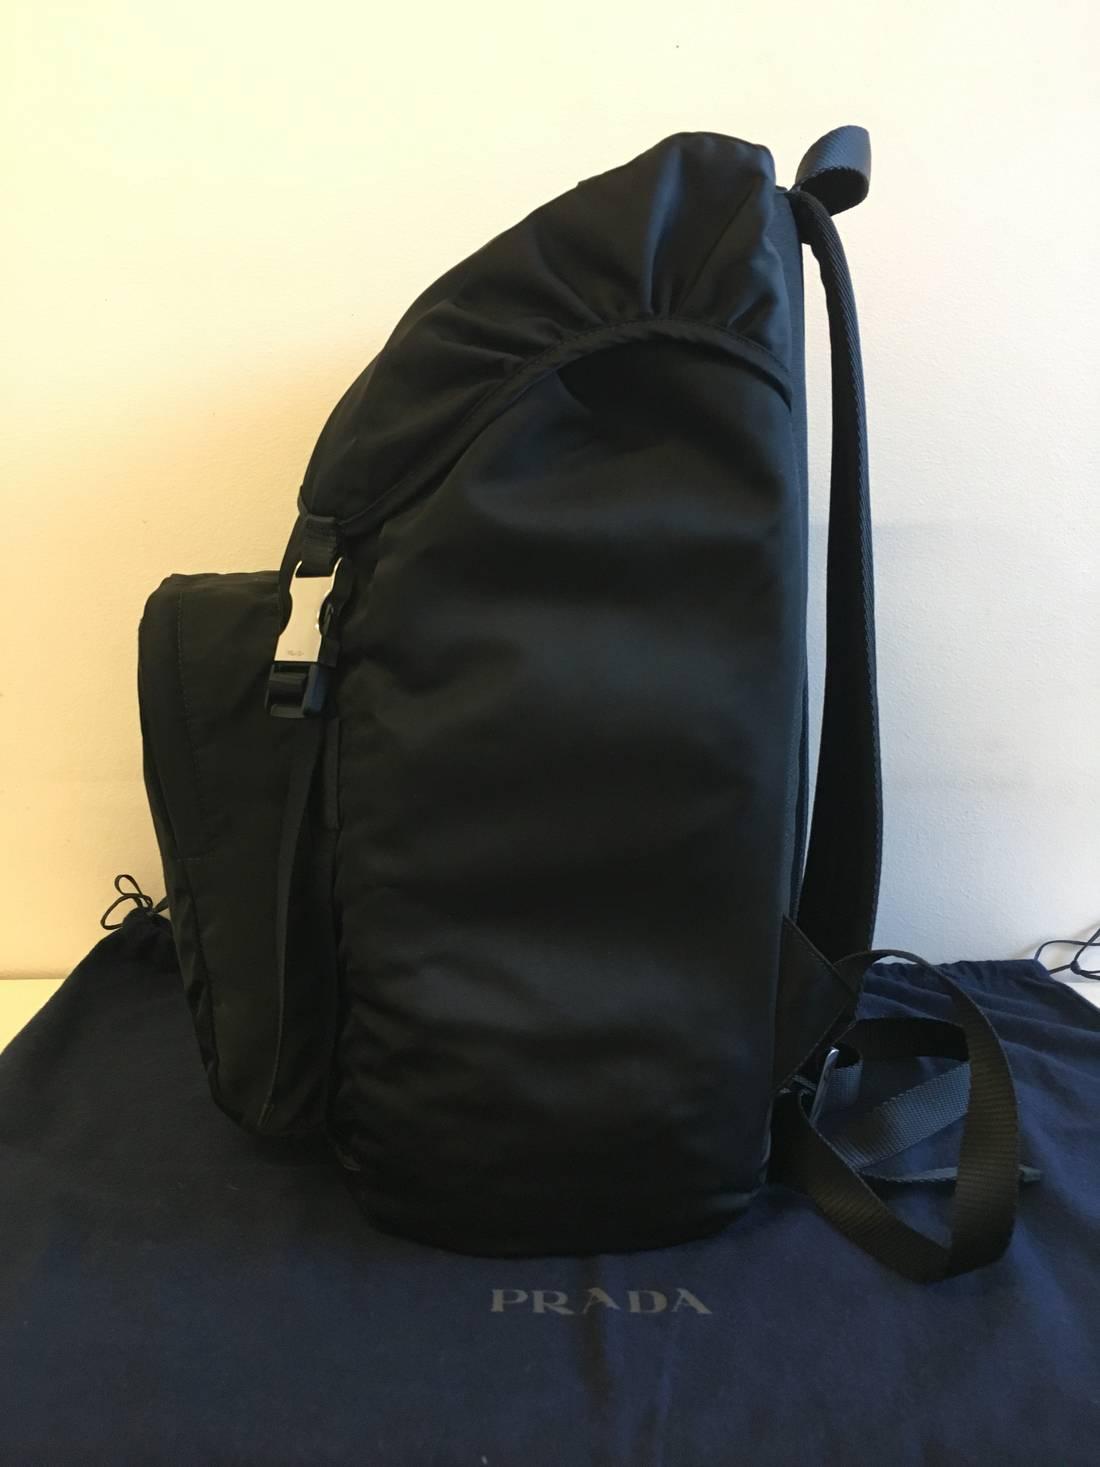 ... where to buy prada v135 nylon backpack size one size 2 a2cfe 82264 6a0fde9e37617